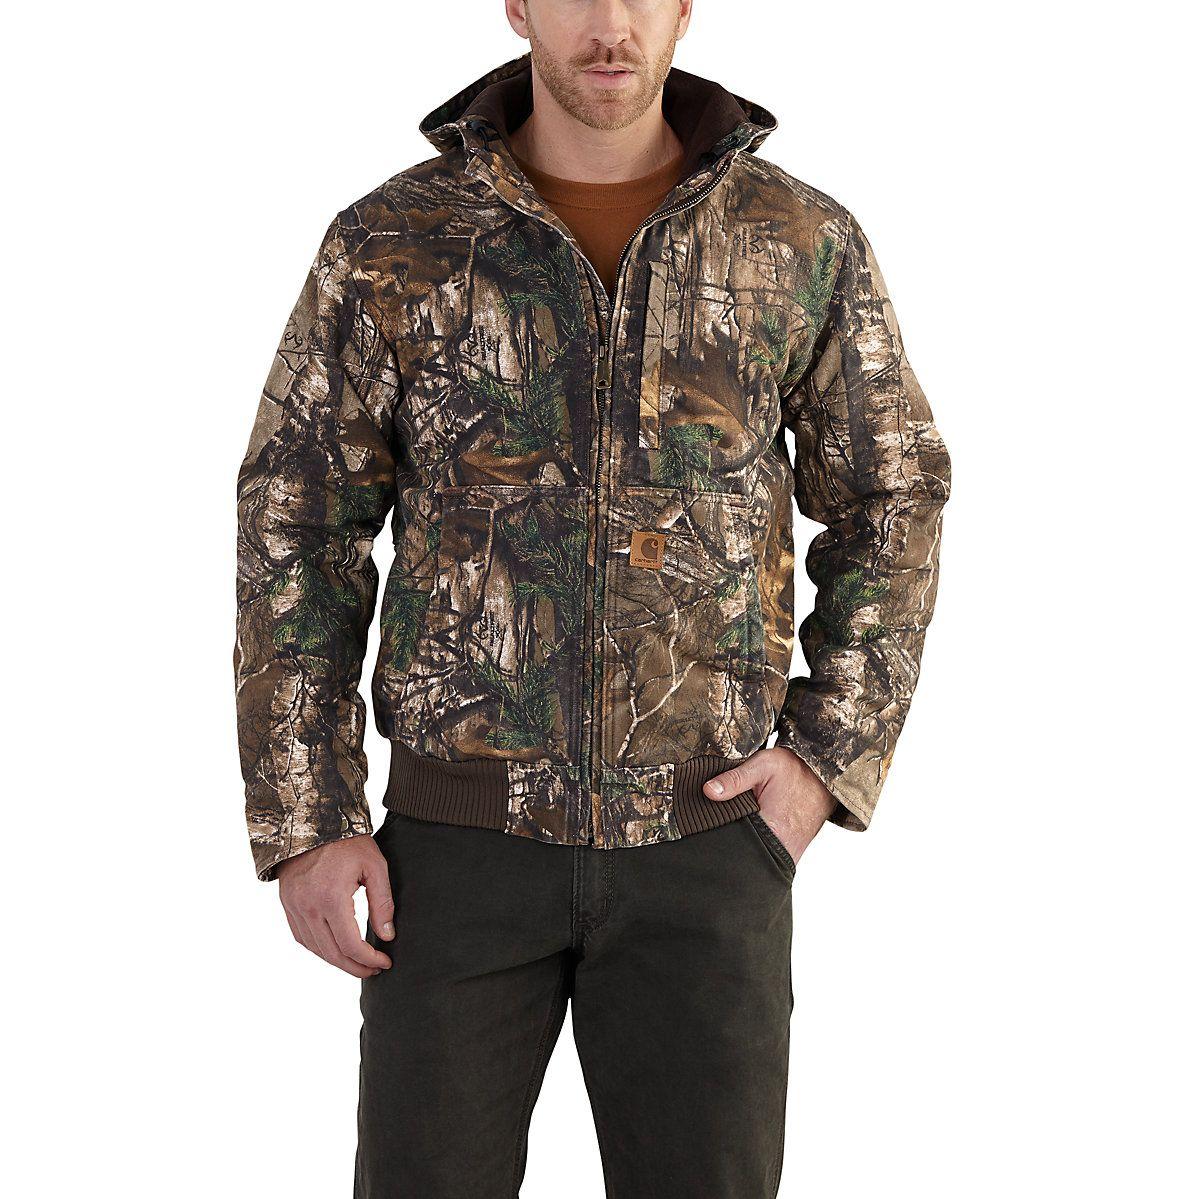 981203cfd5a17 Carhartt Camo FULLSWING Heavyweight Fleece Lined Jacket. Attached Fleece  Lined Hood with Drawstrings.